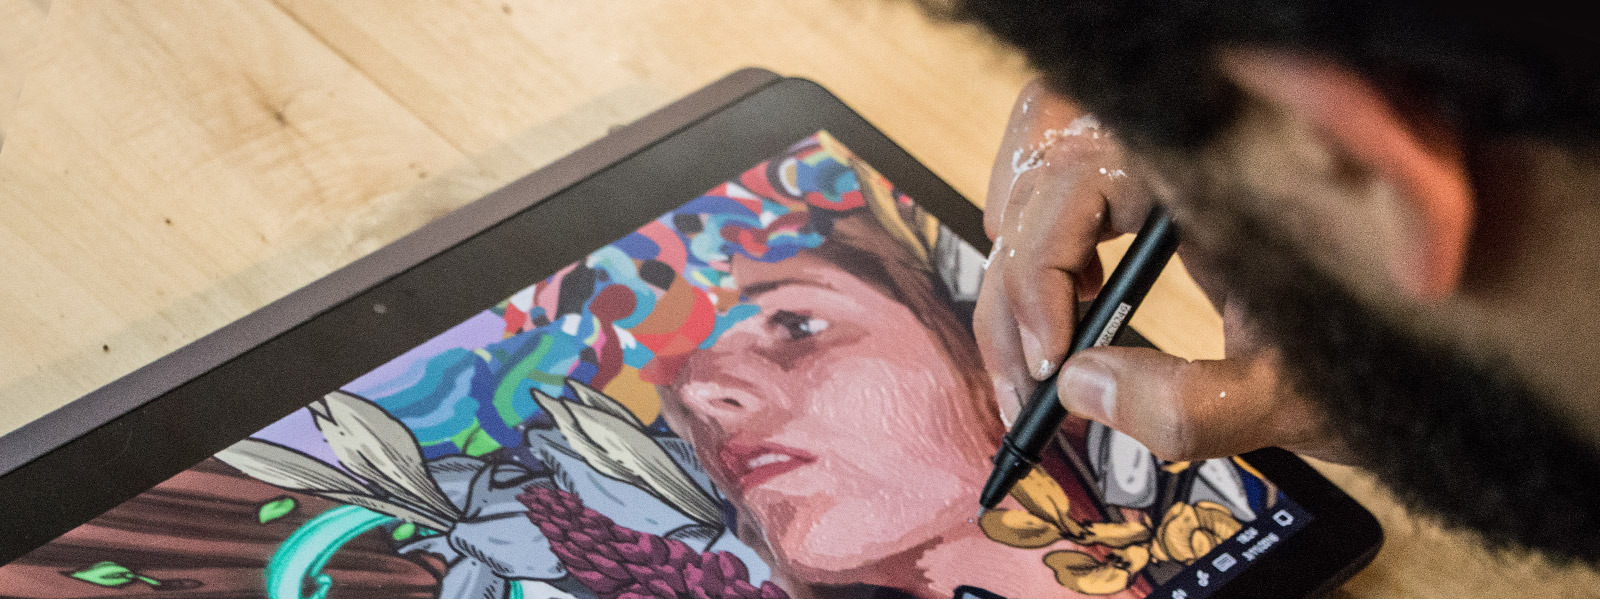 Windows Ink op Lenovo Yoga-tabletmodus